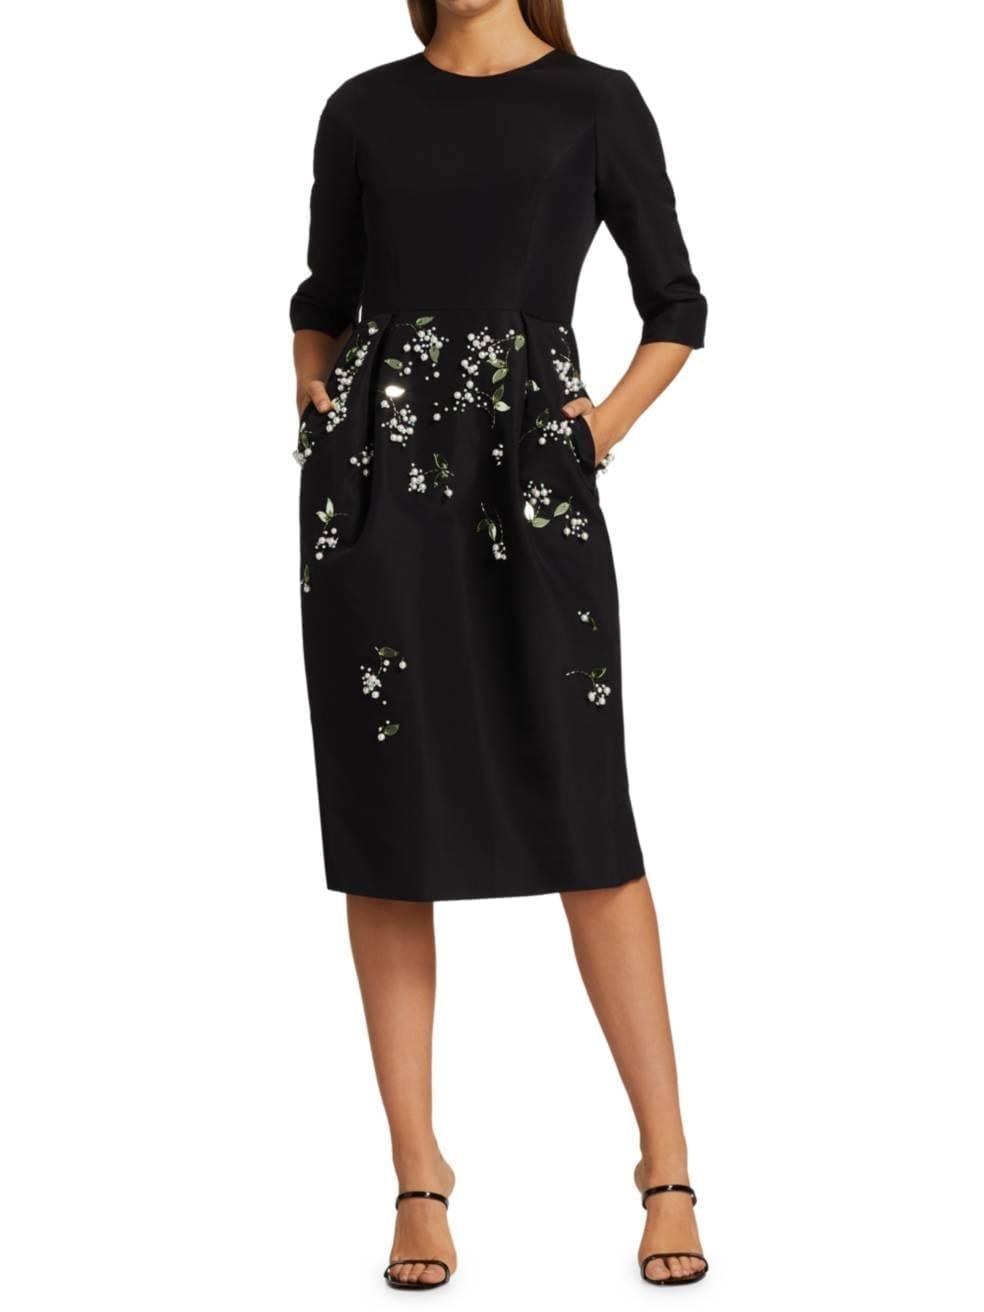 CAROLINA HERRERA Embellished Silk Crepe de Chine Sheath Dress